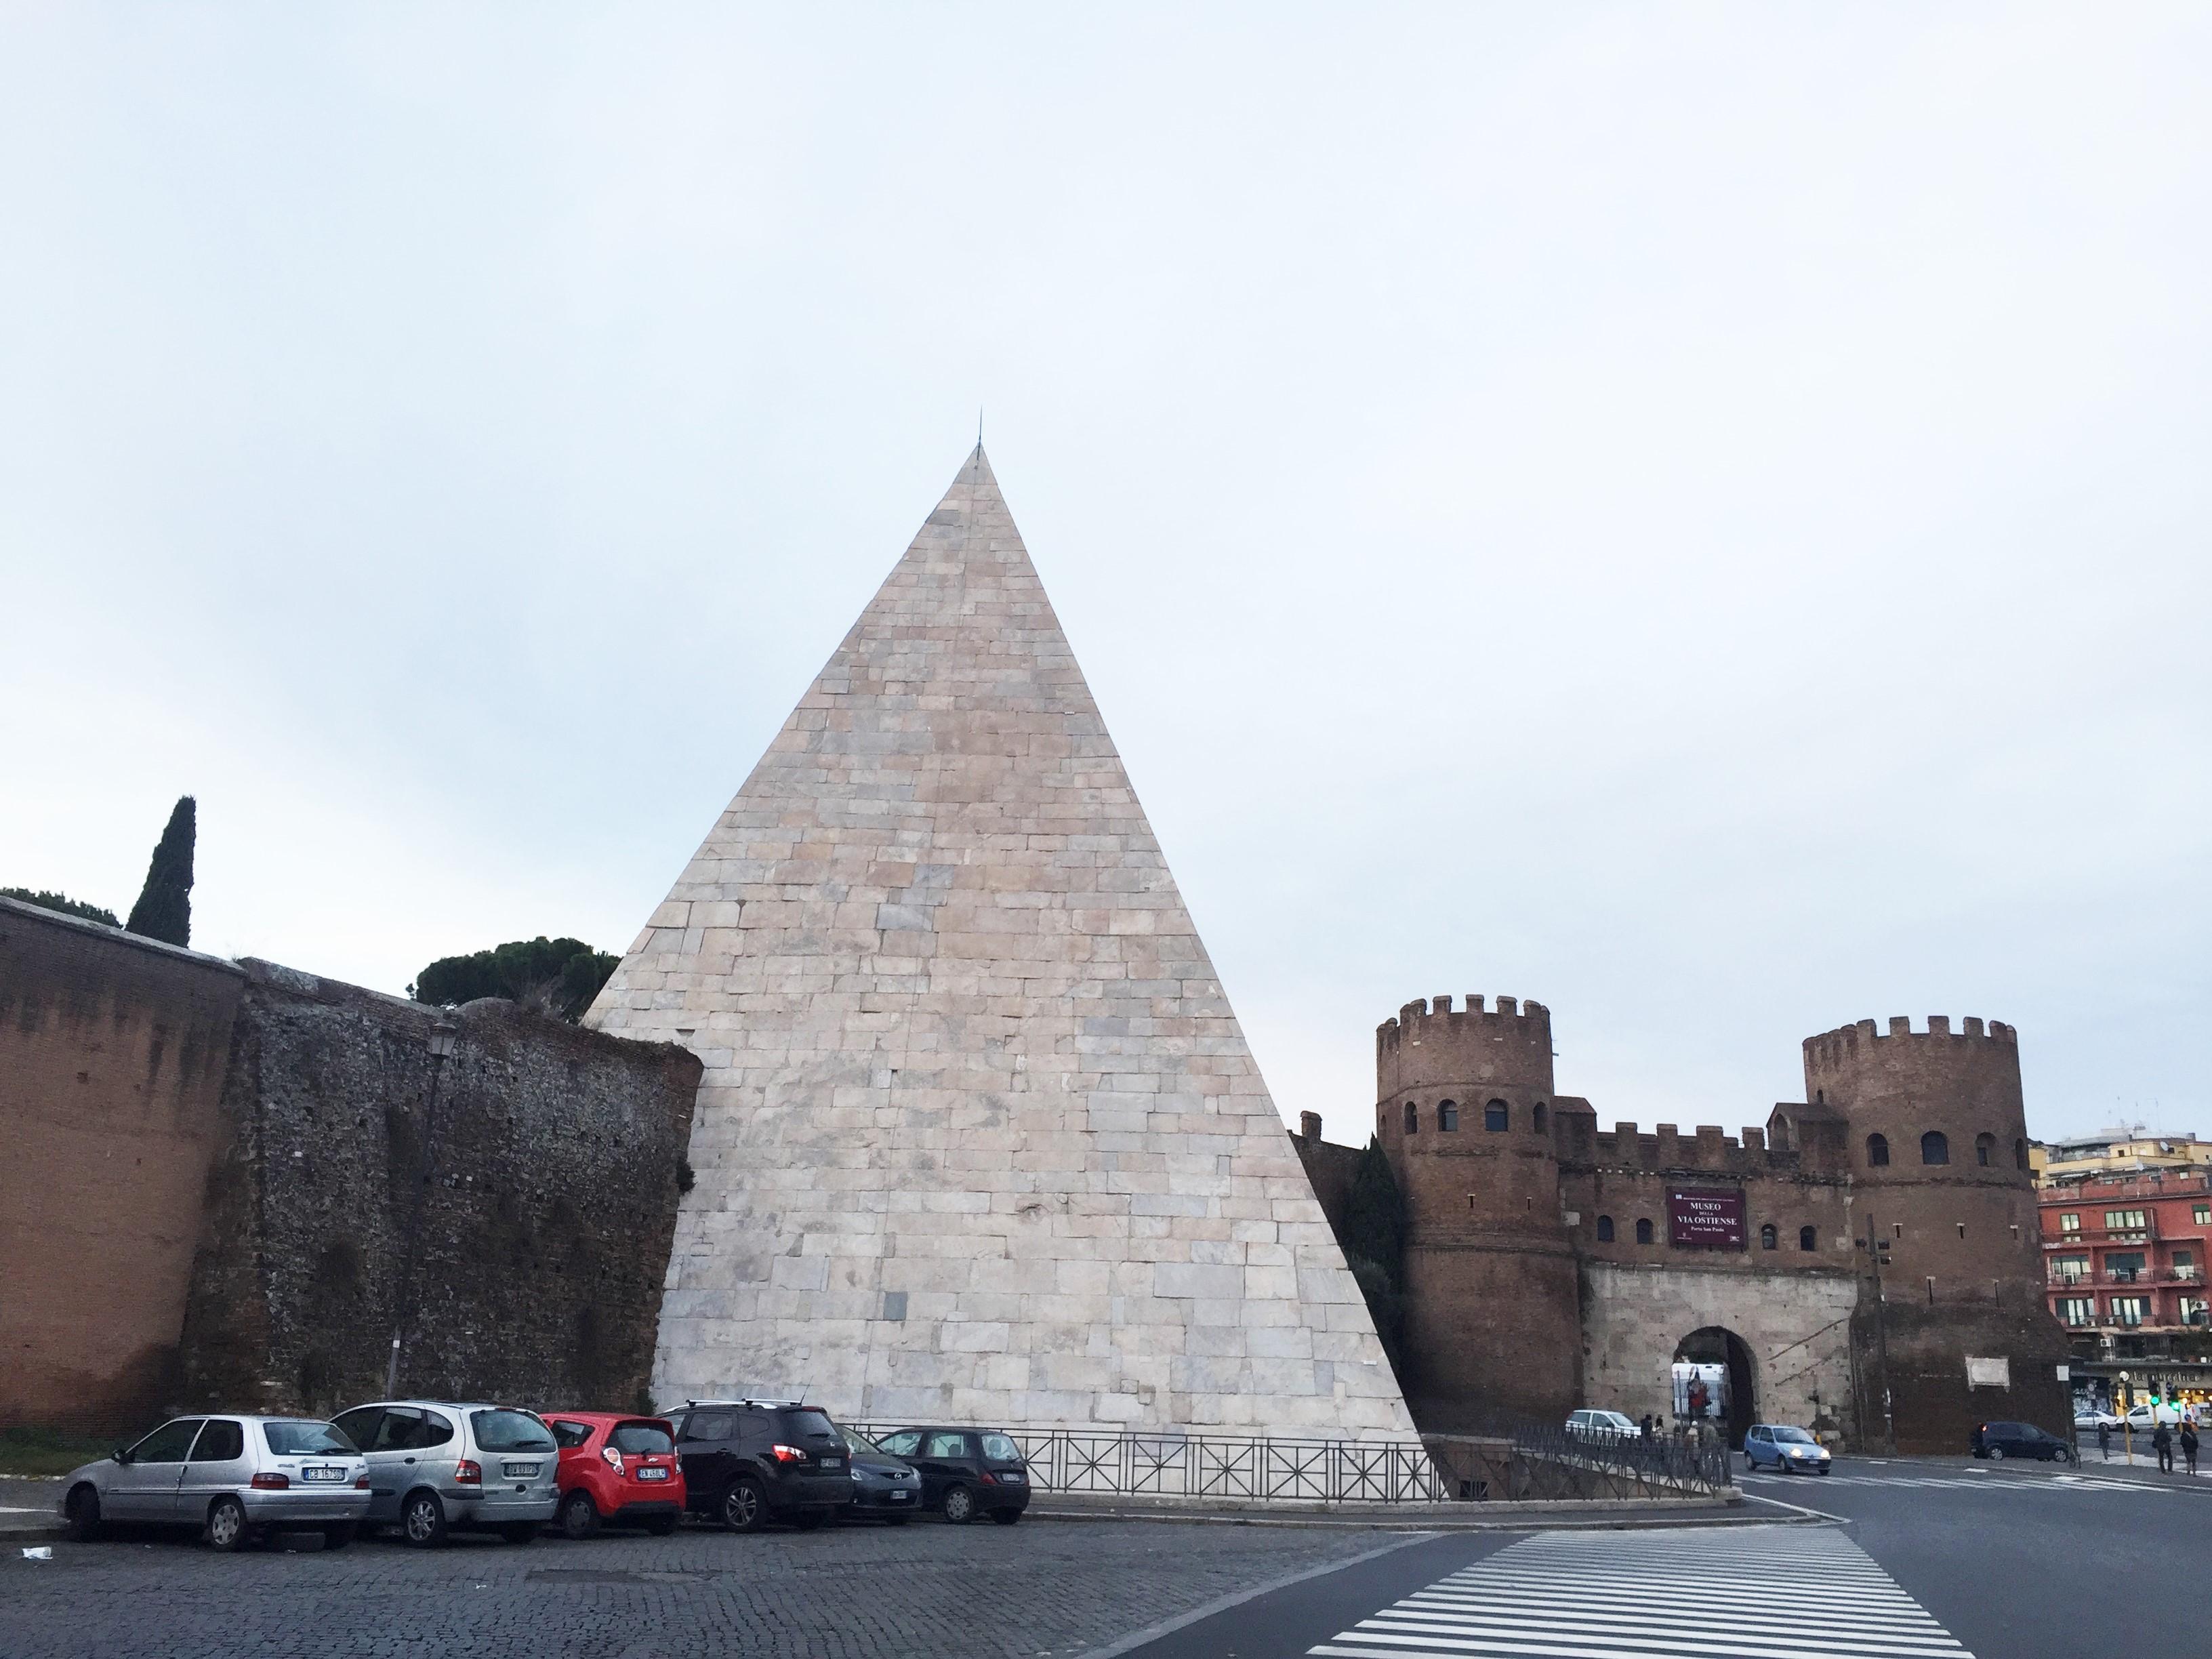 Pirâmide Caio Castro